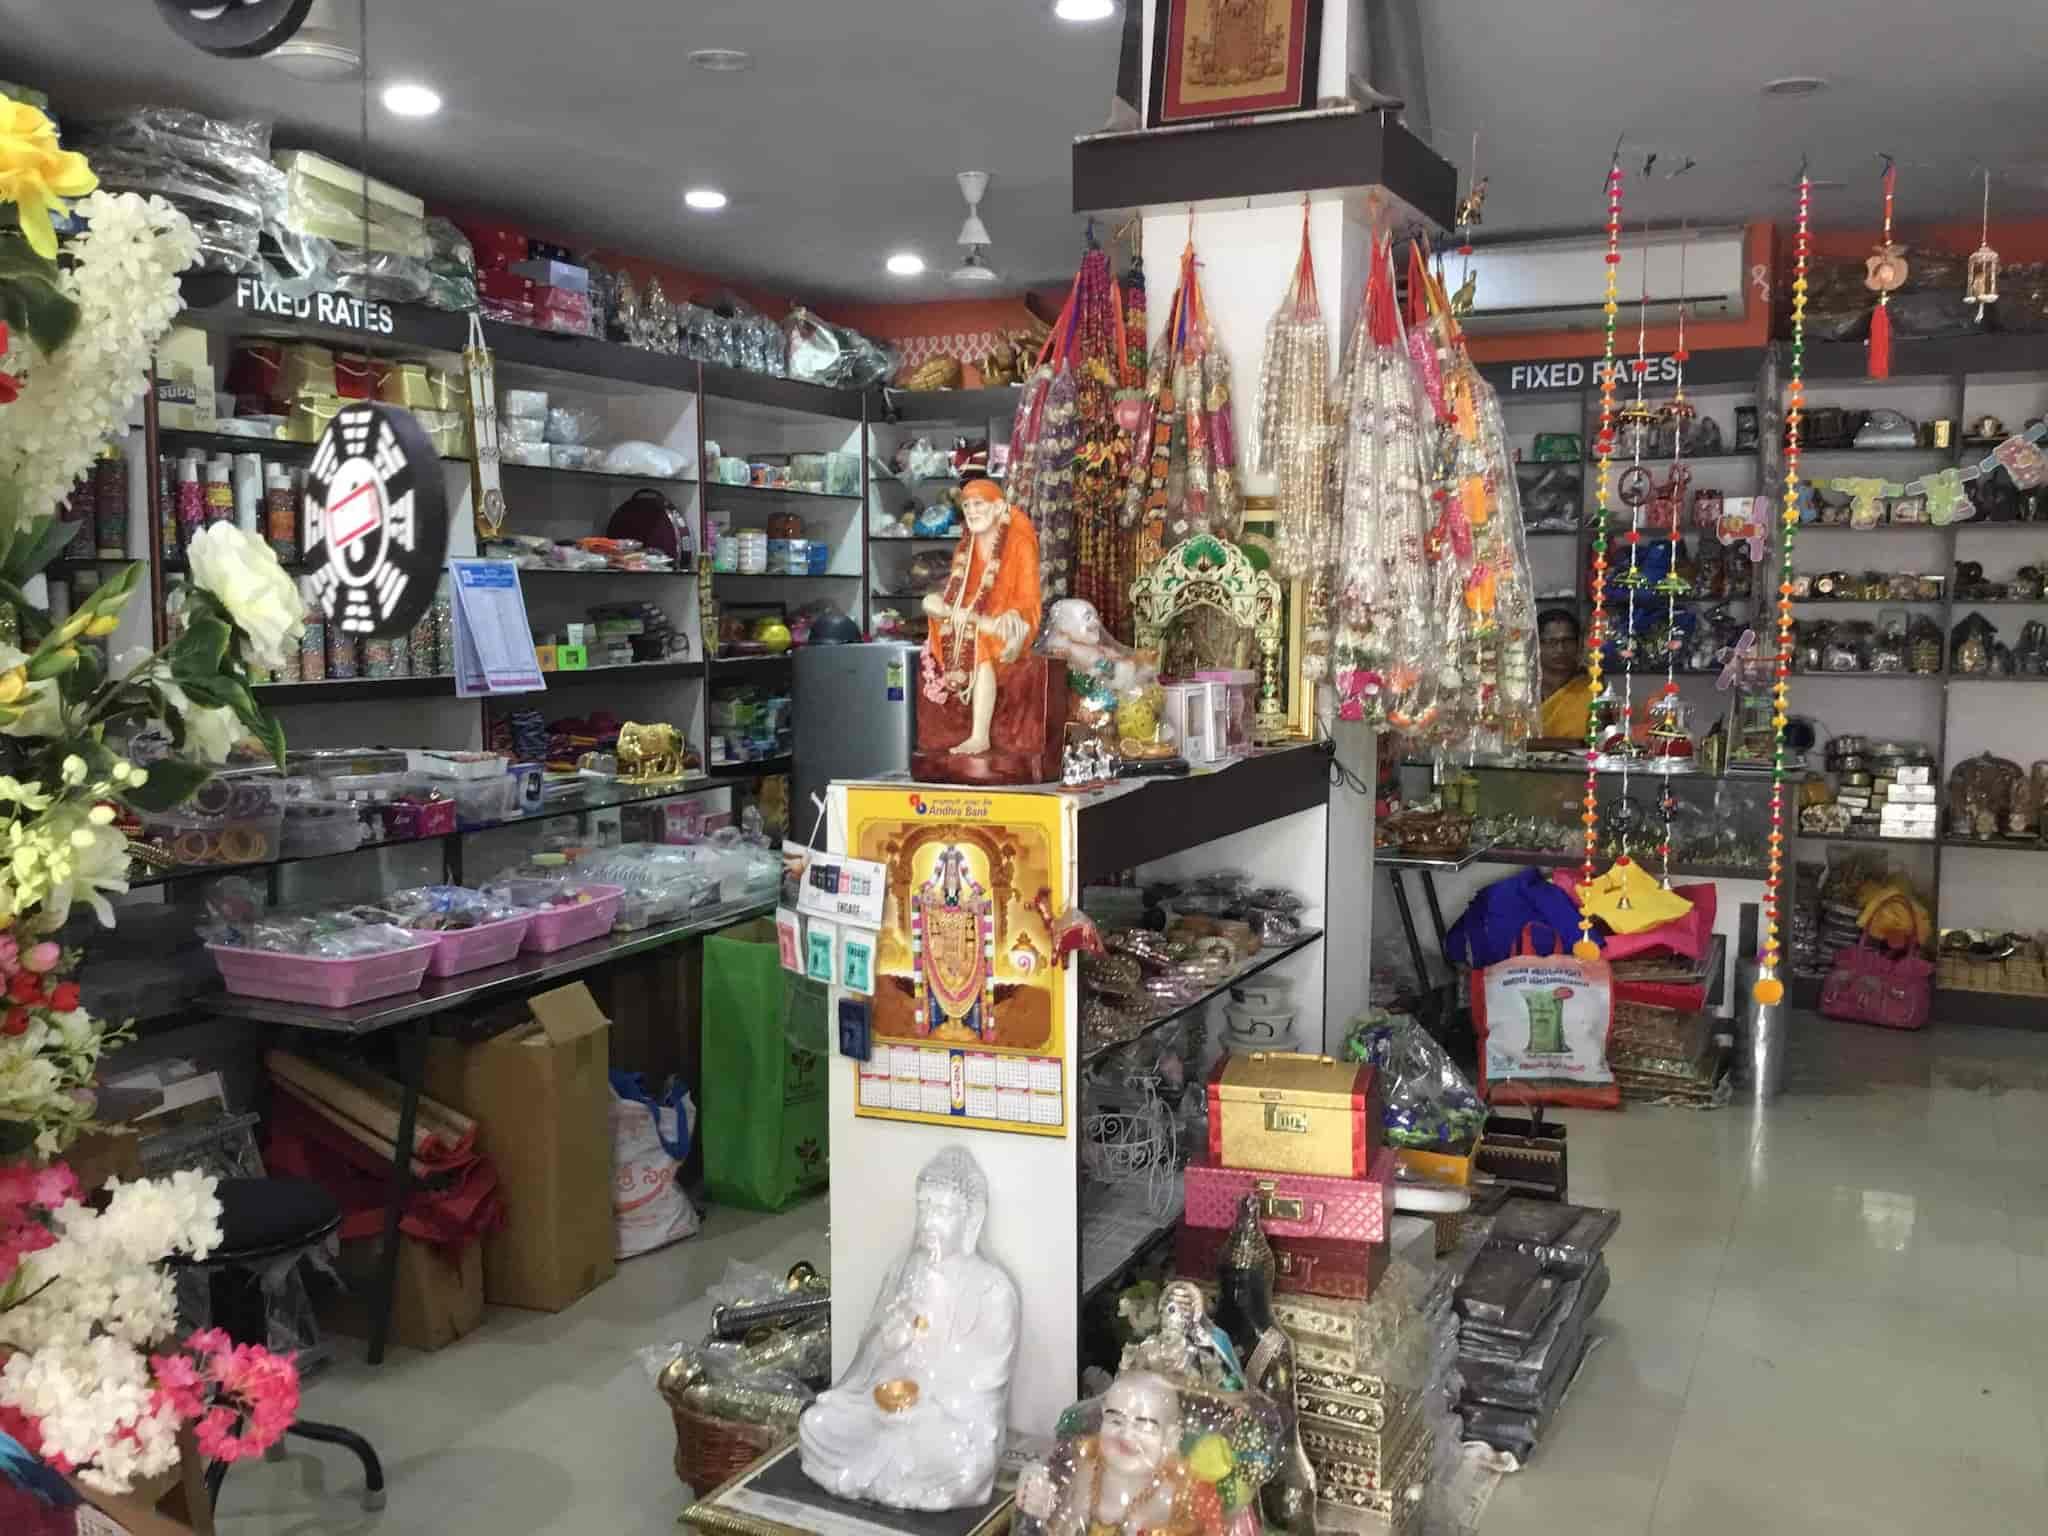 Aparna Jutes & Pooja Stores, Moghalraja Puram - Puja Item Dealers in